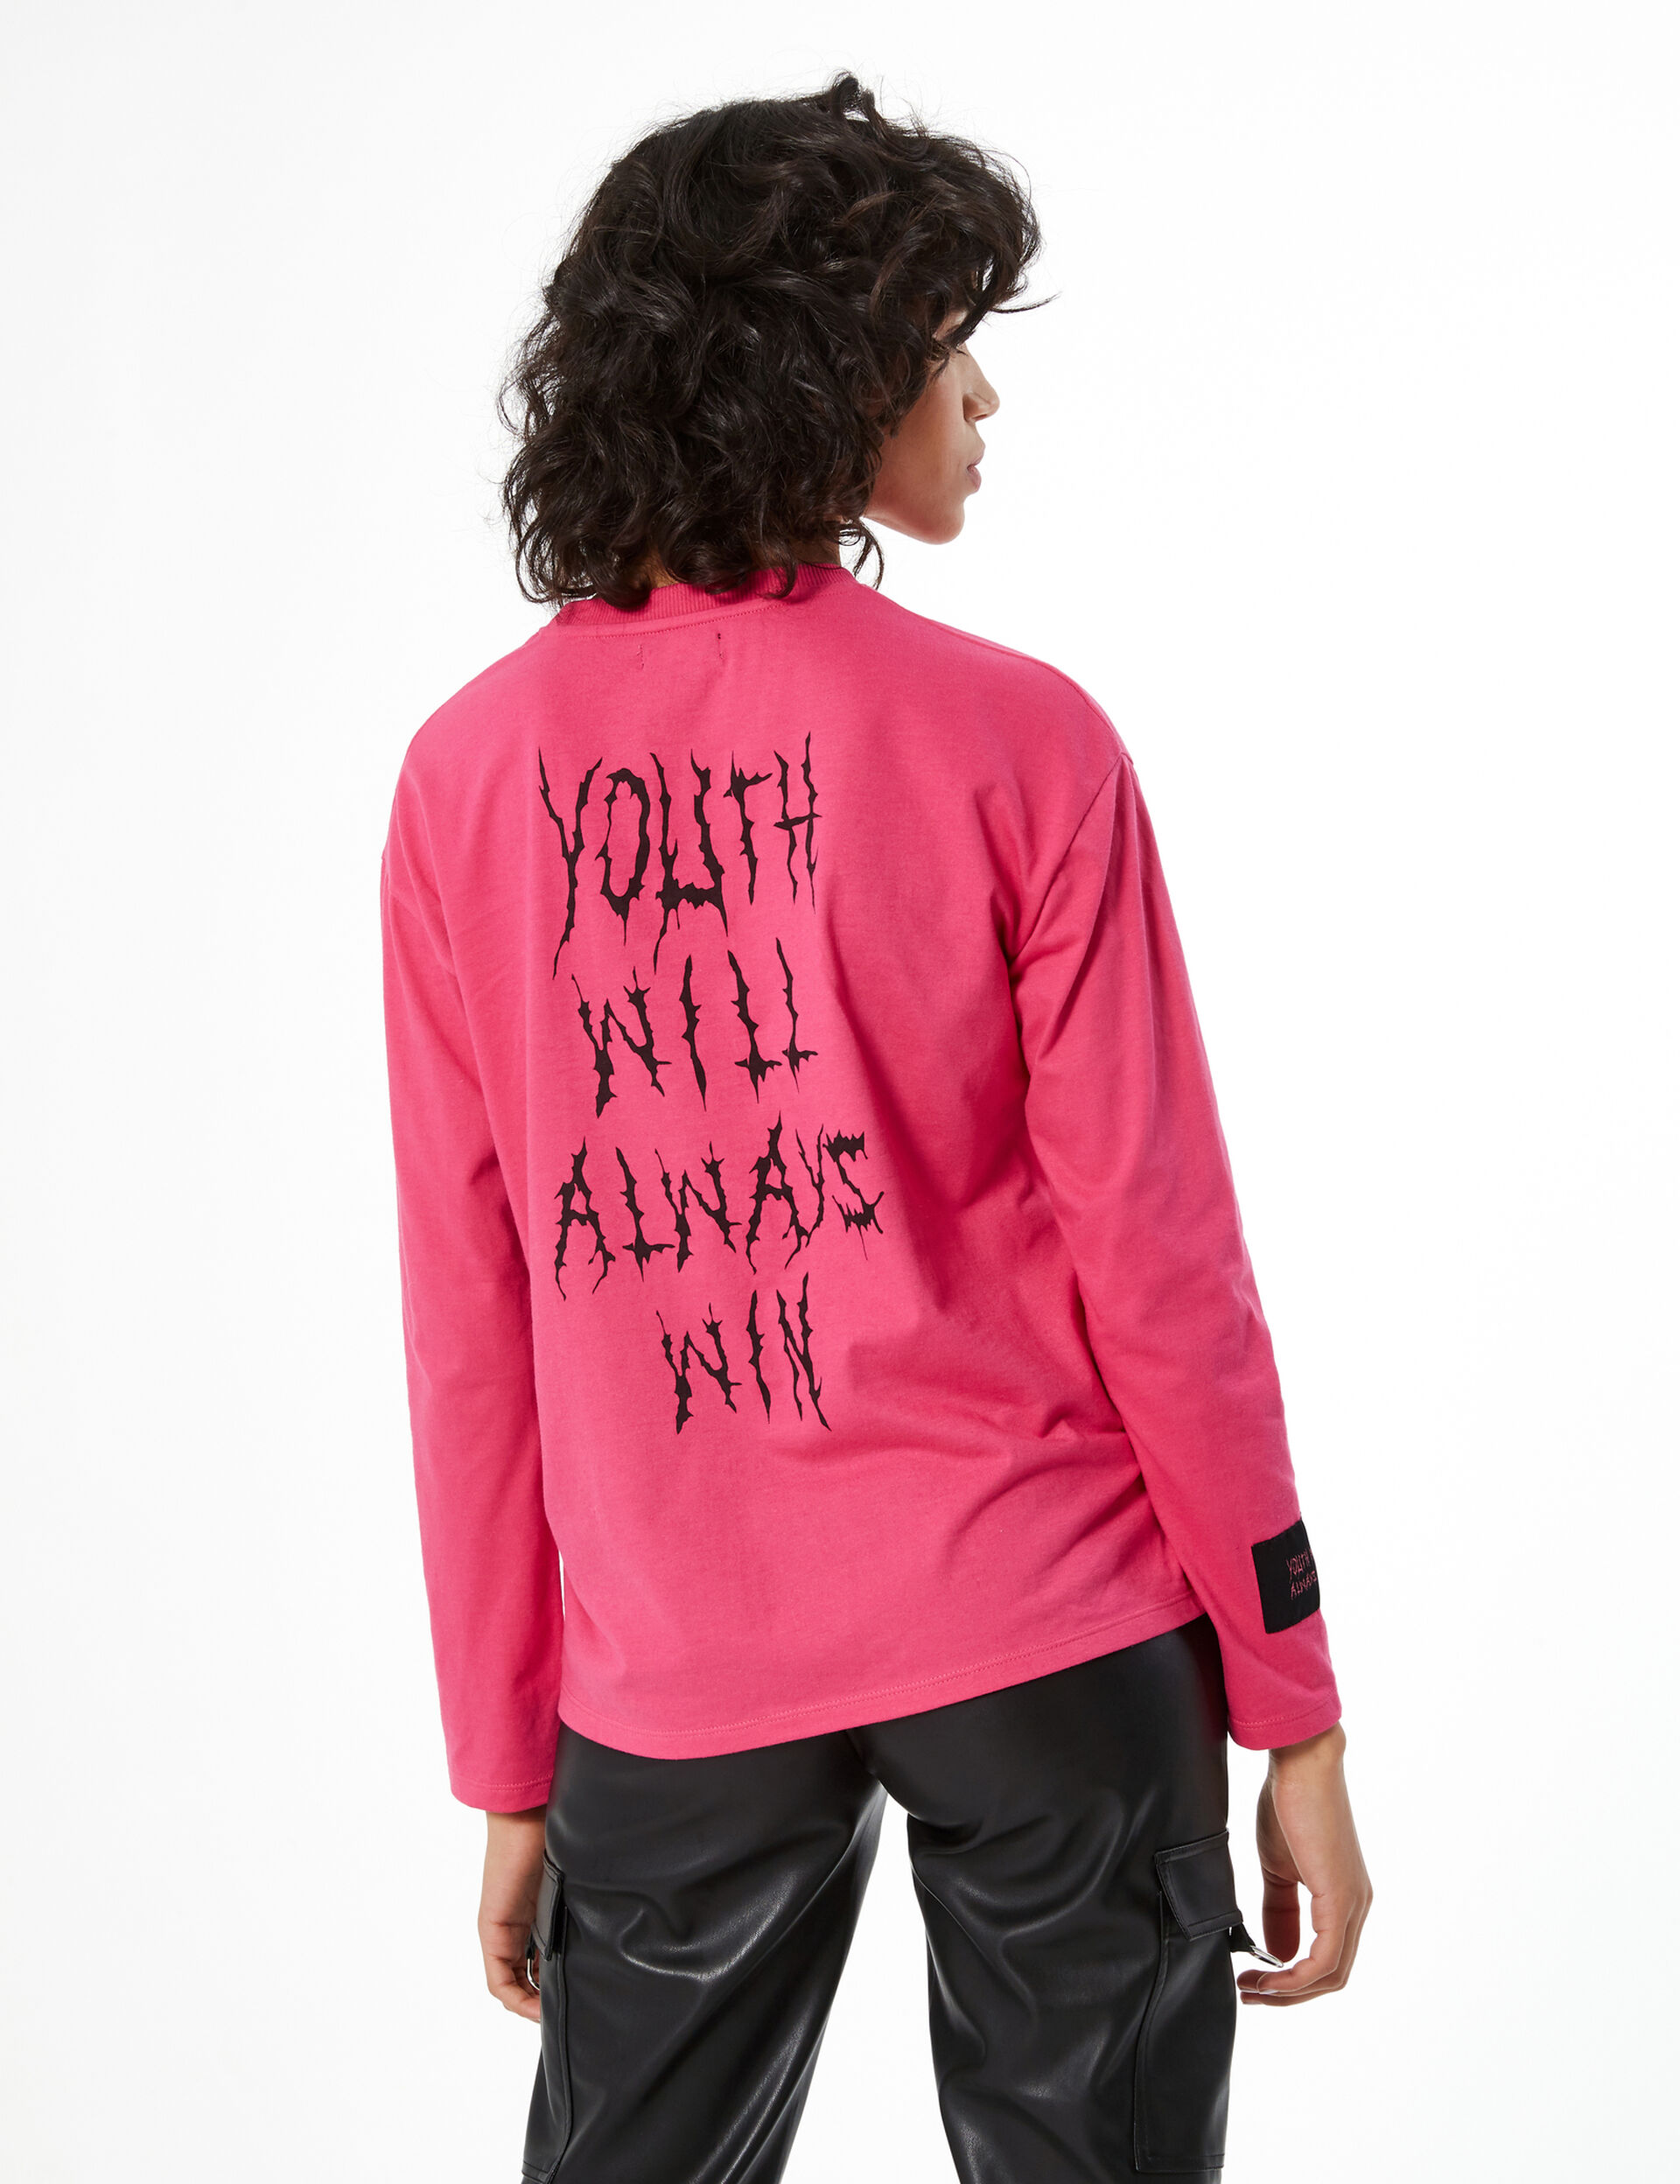 Tee-shirt youth tour